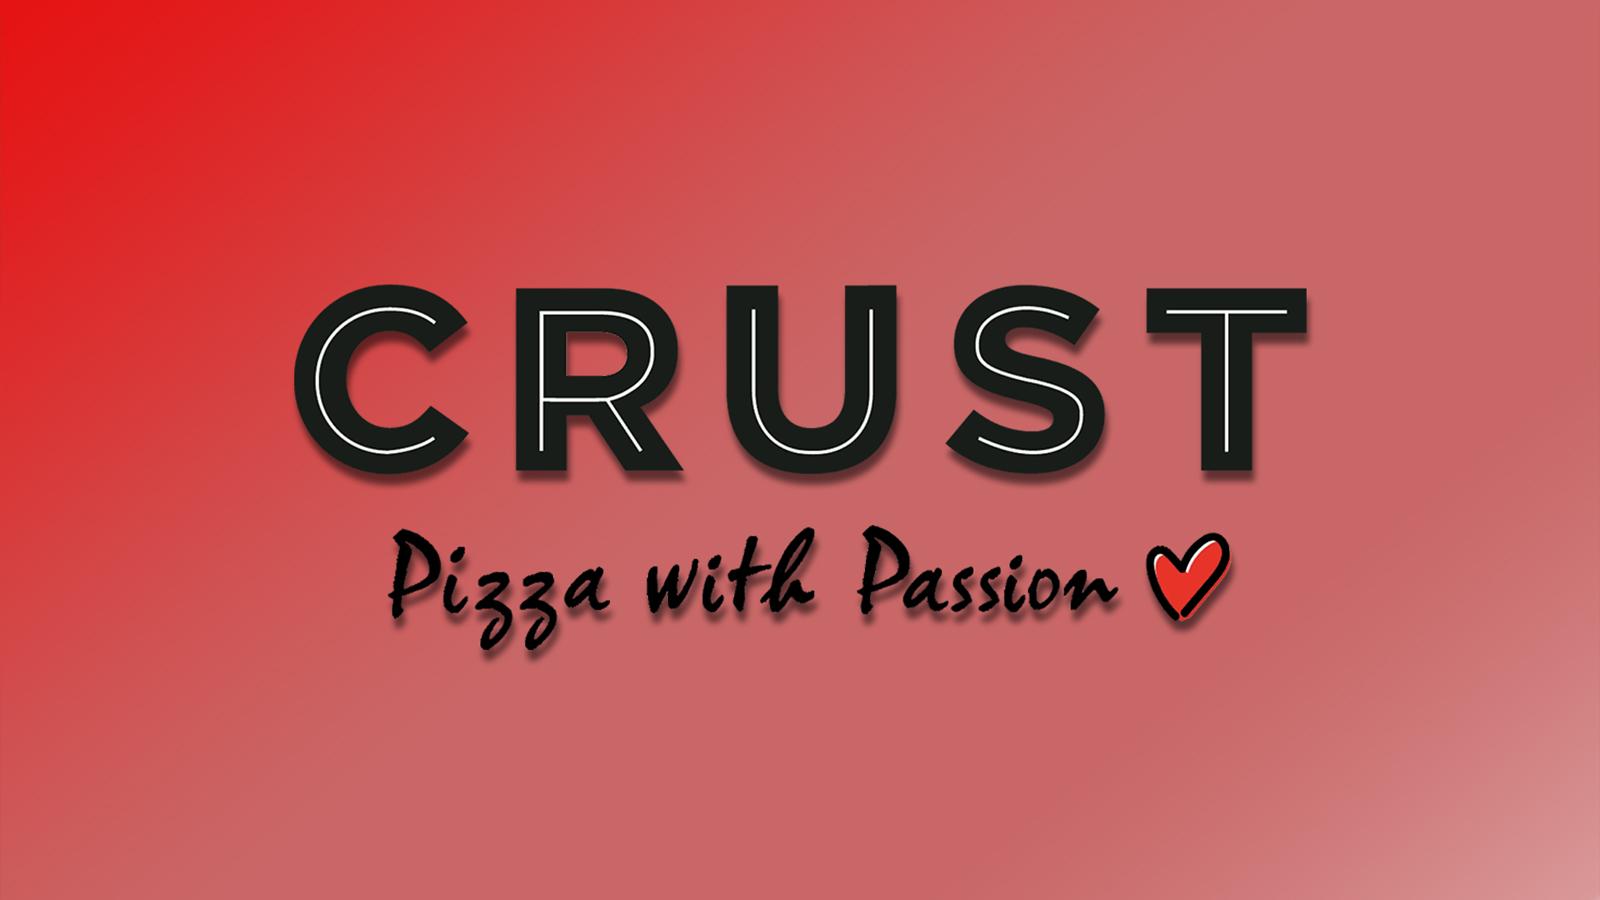 Crustcover4